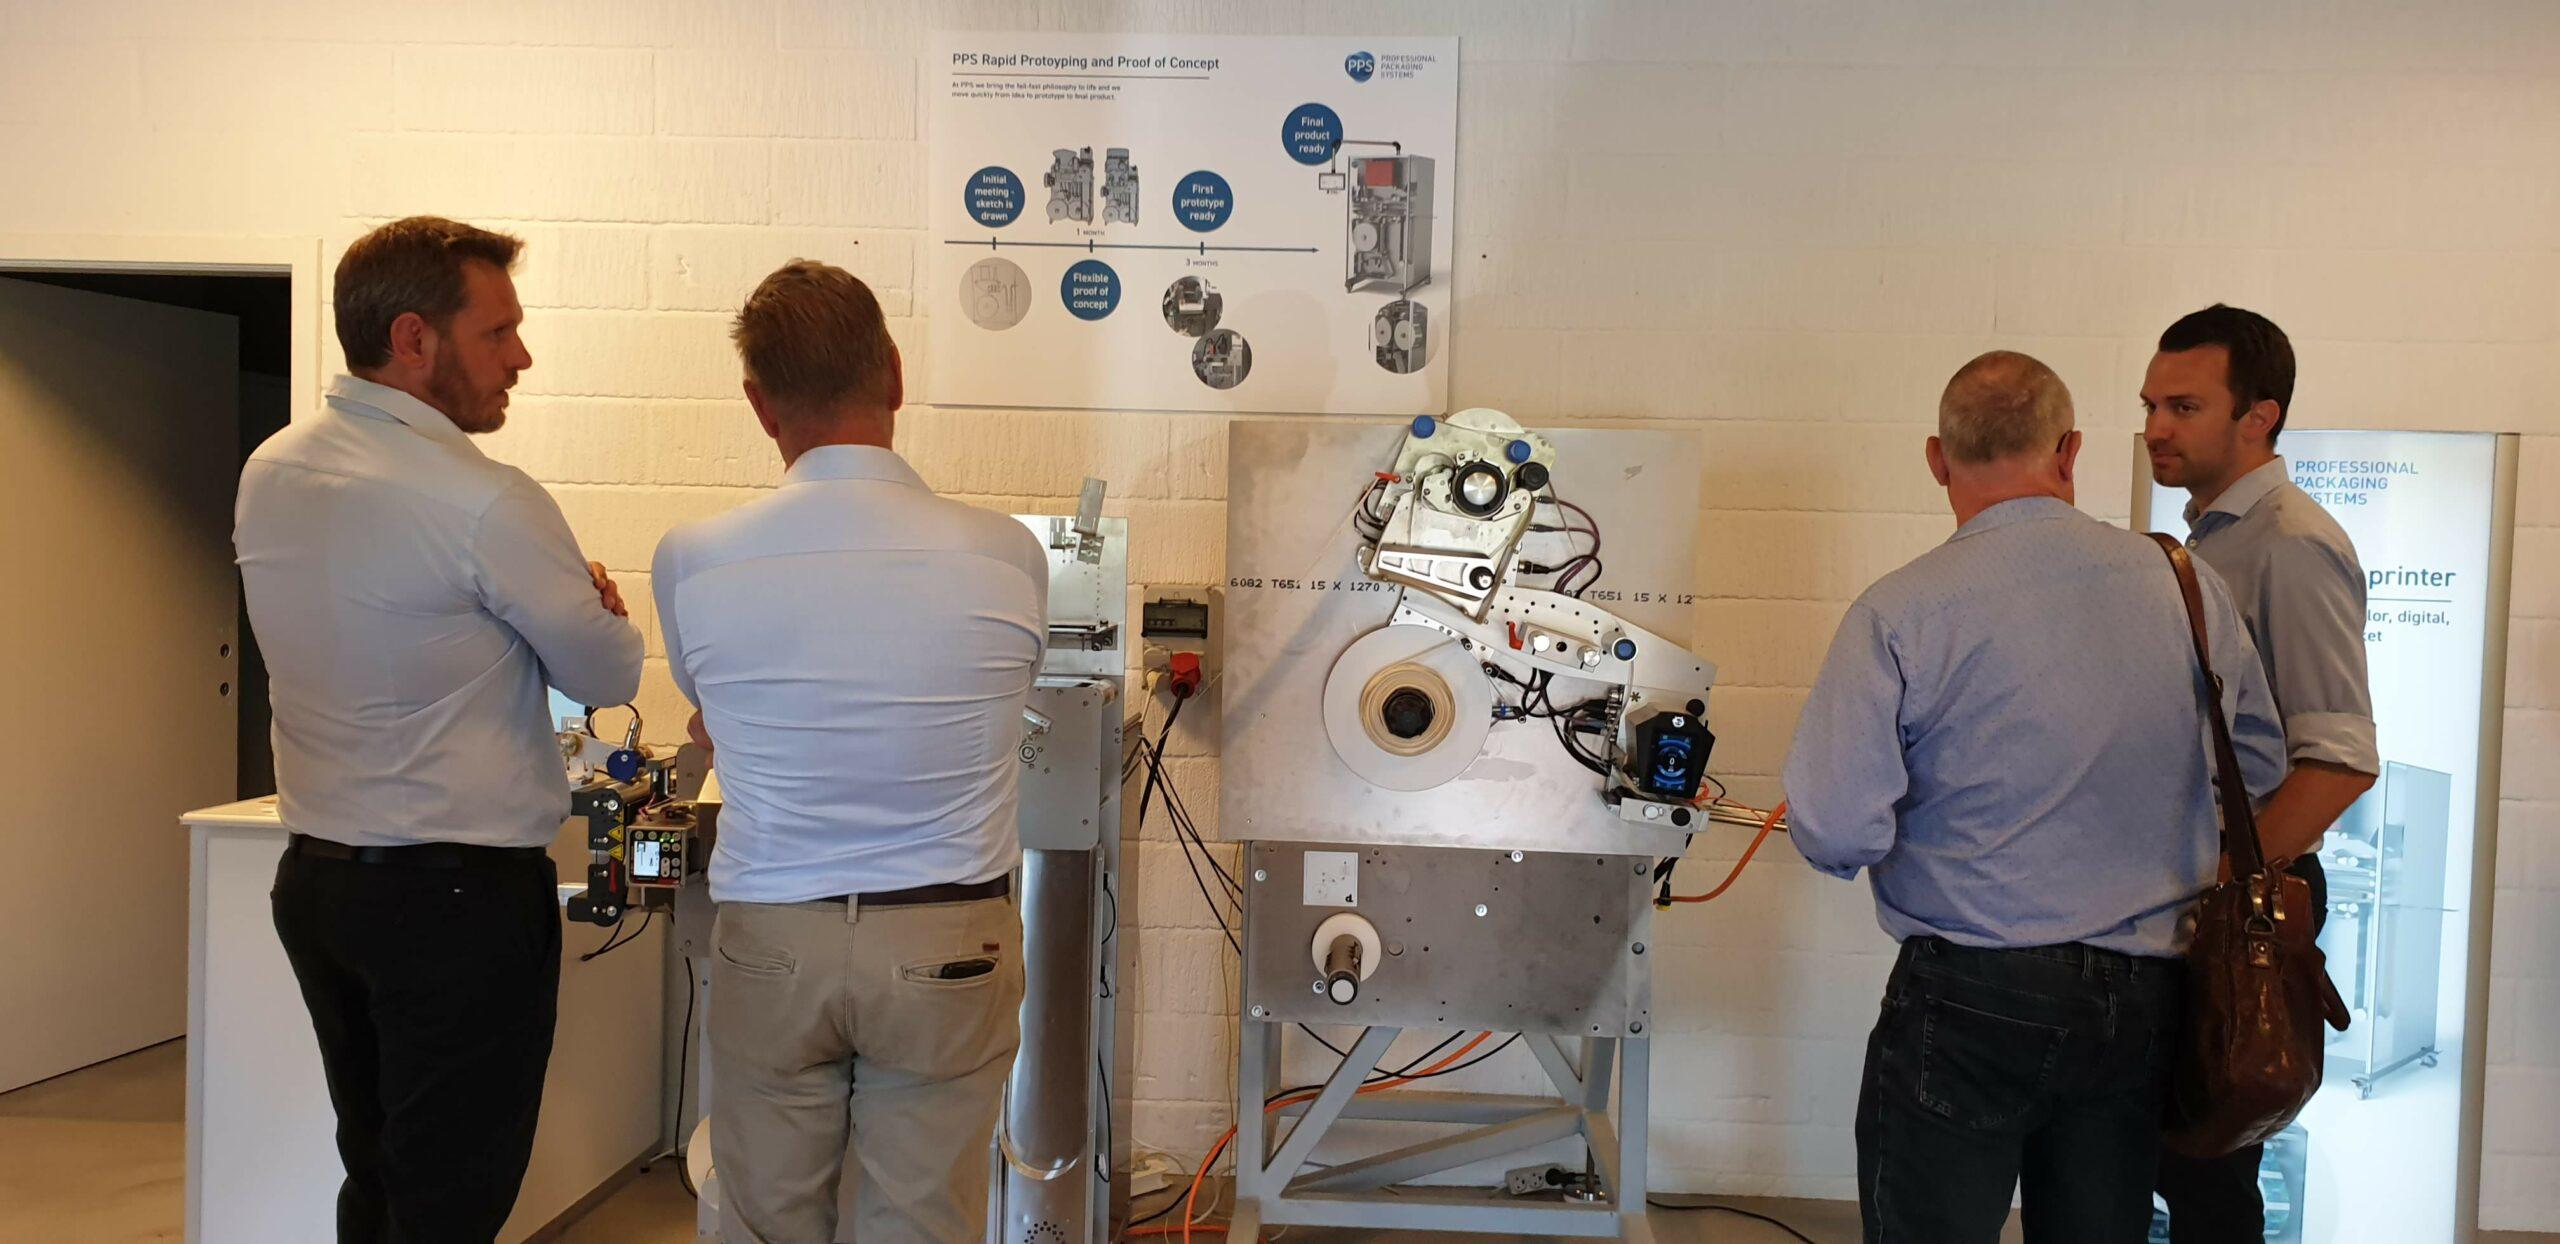 PPS seminar om automatisering og robotter